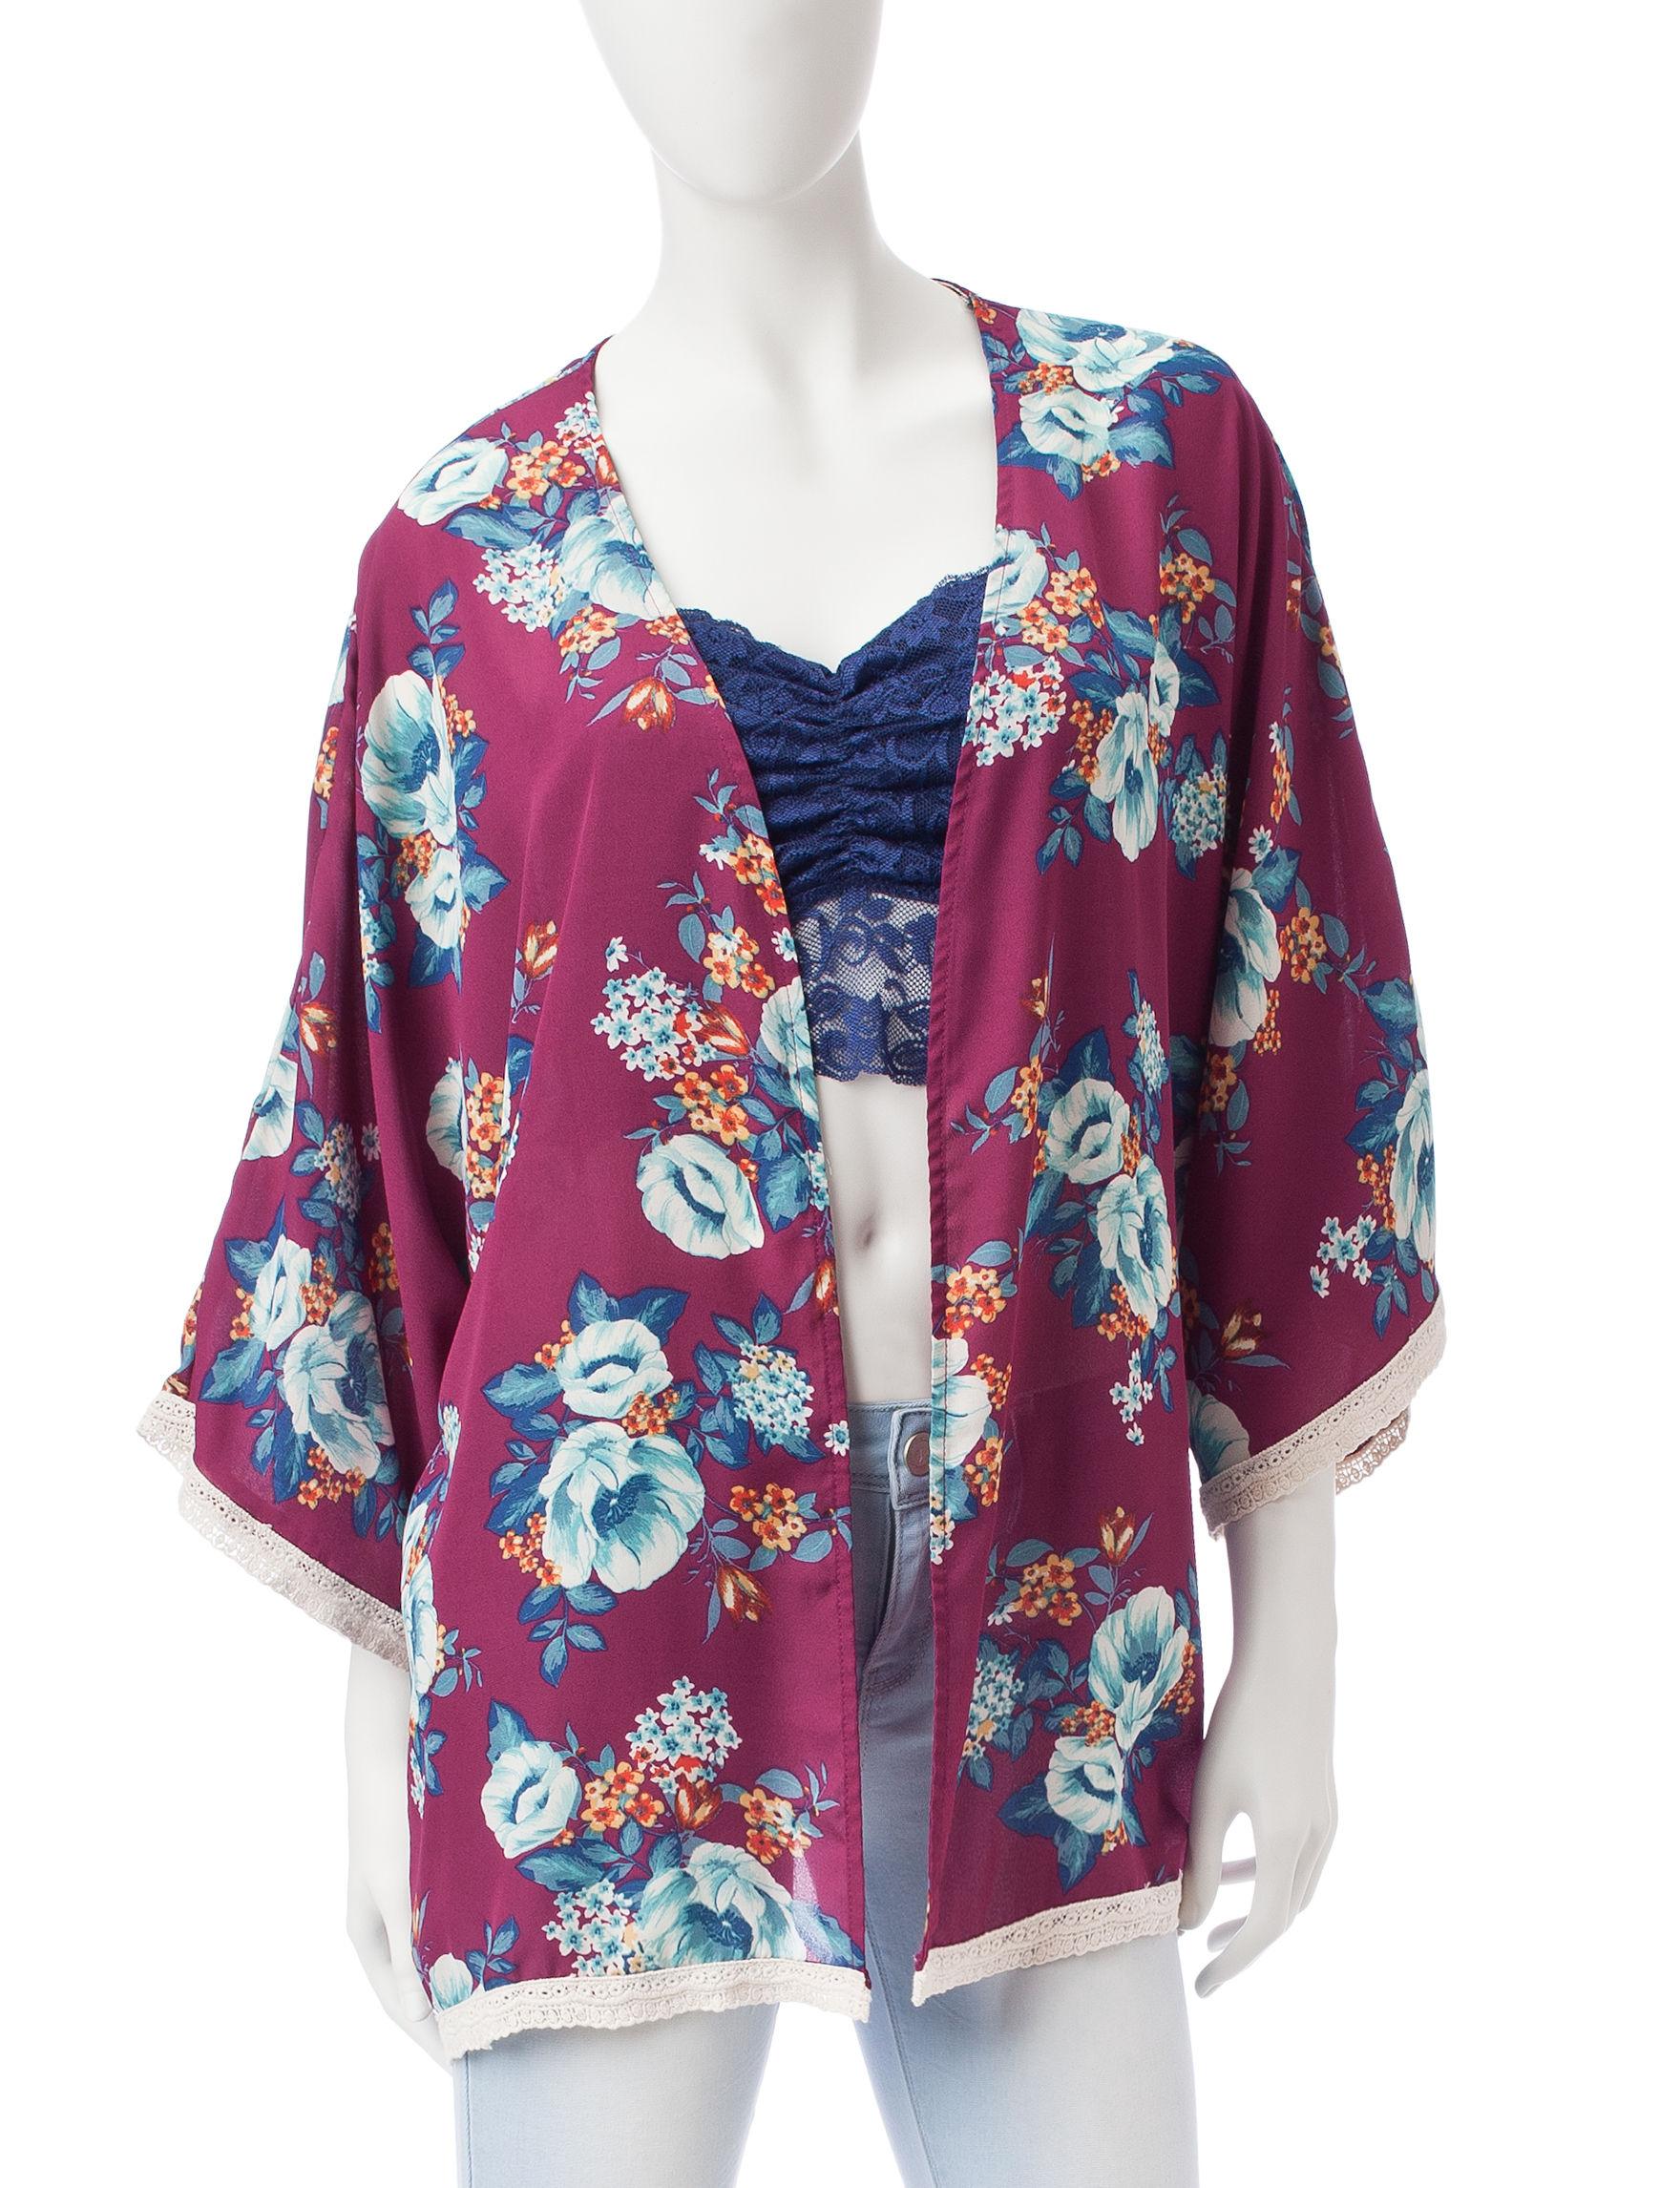 Wishful Park Burgundy Kimonos Shirts & Blouses